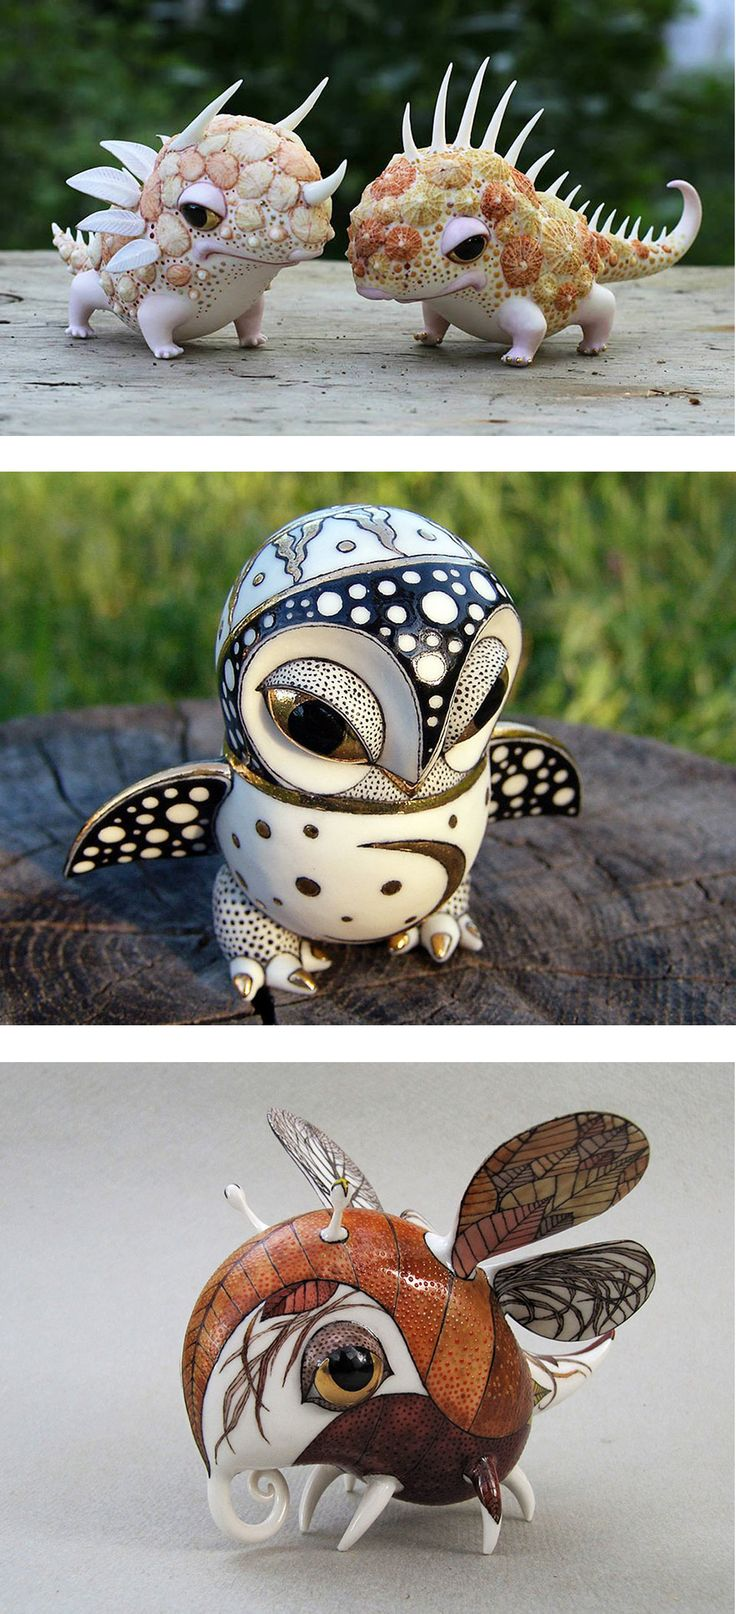 Whimsical porcelain creatures by Ukranian artists Anya Stasenko & Slava Leontyev. Lots more at the link.